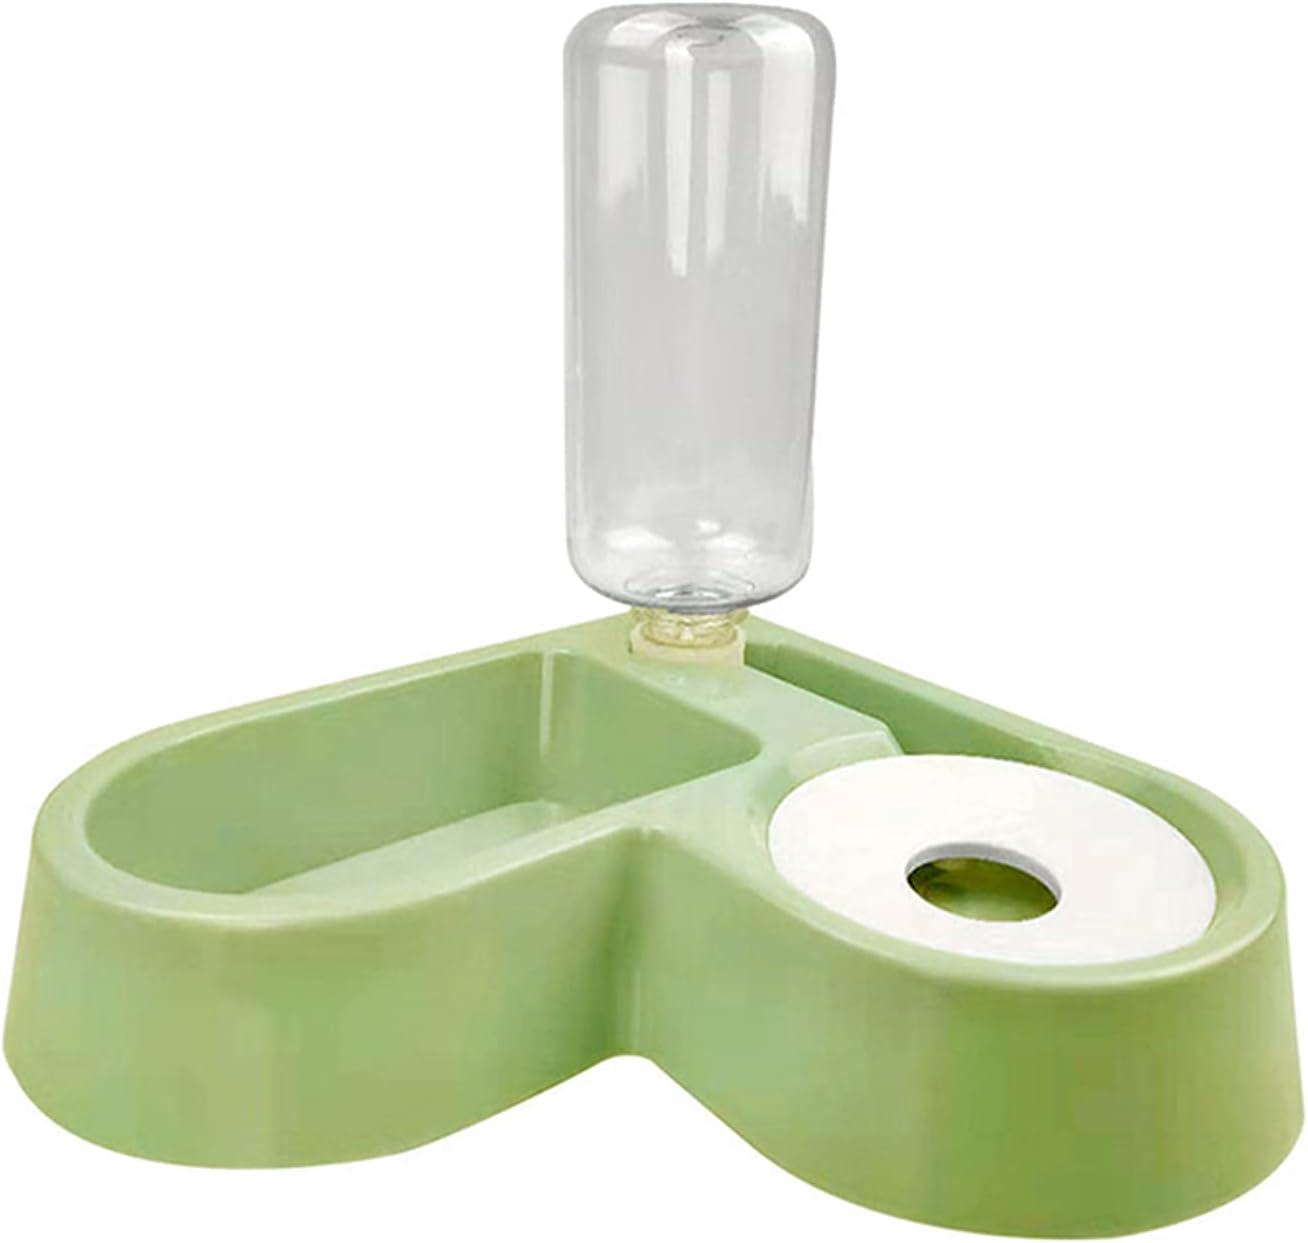 2 in 1 Dog Food and Water Bowl Set Heart Shape Wall Corner Pet Automatic Water Dispenser Detachable Feeder Bowl 55ml-Jiangshen